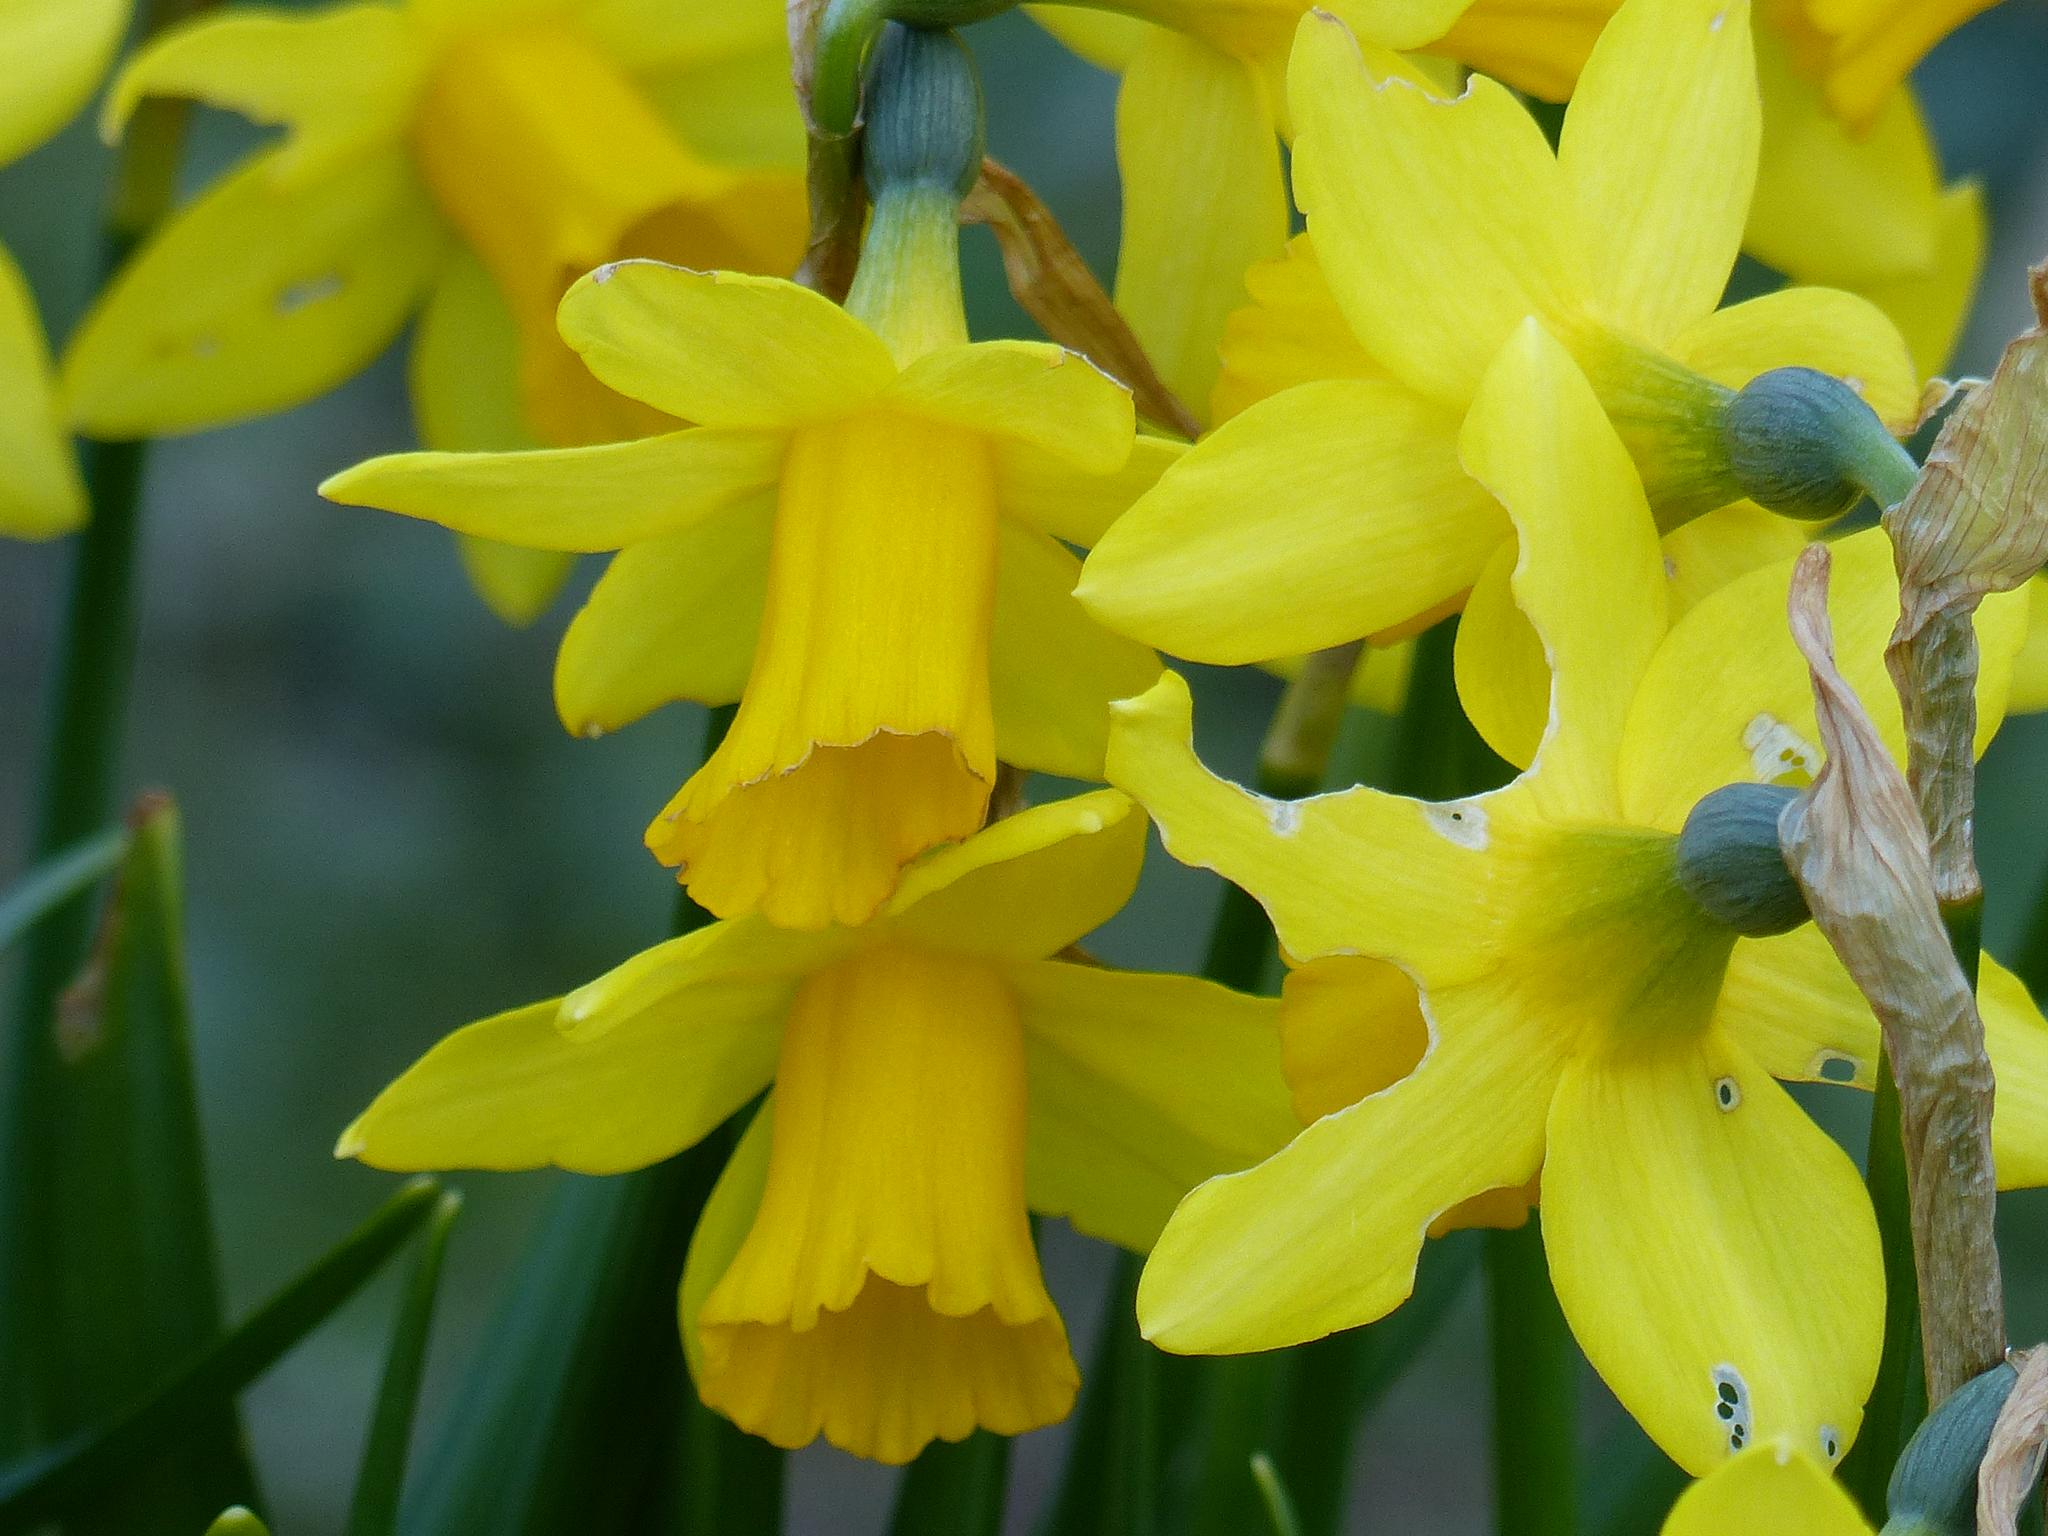 Mini Daffodil's by Malc Thomason